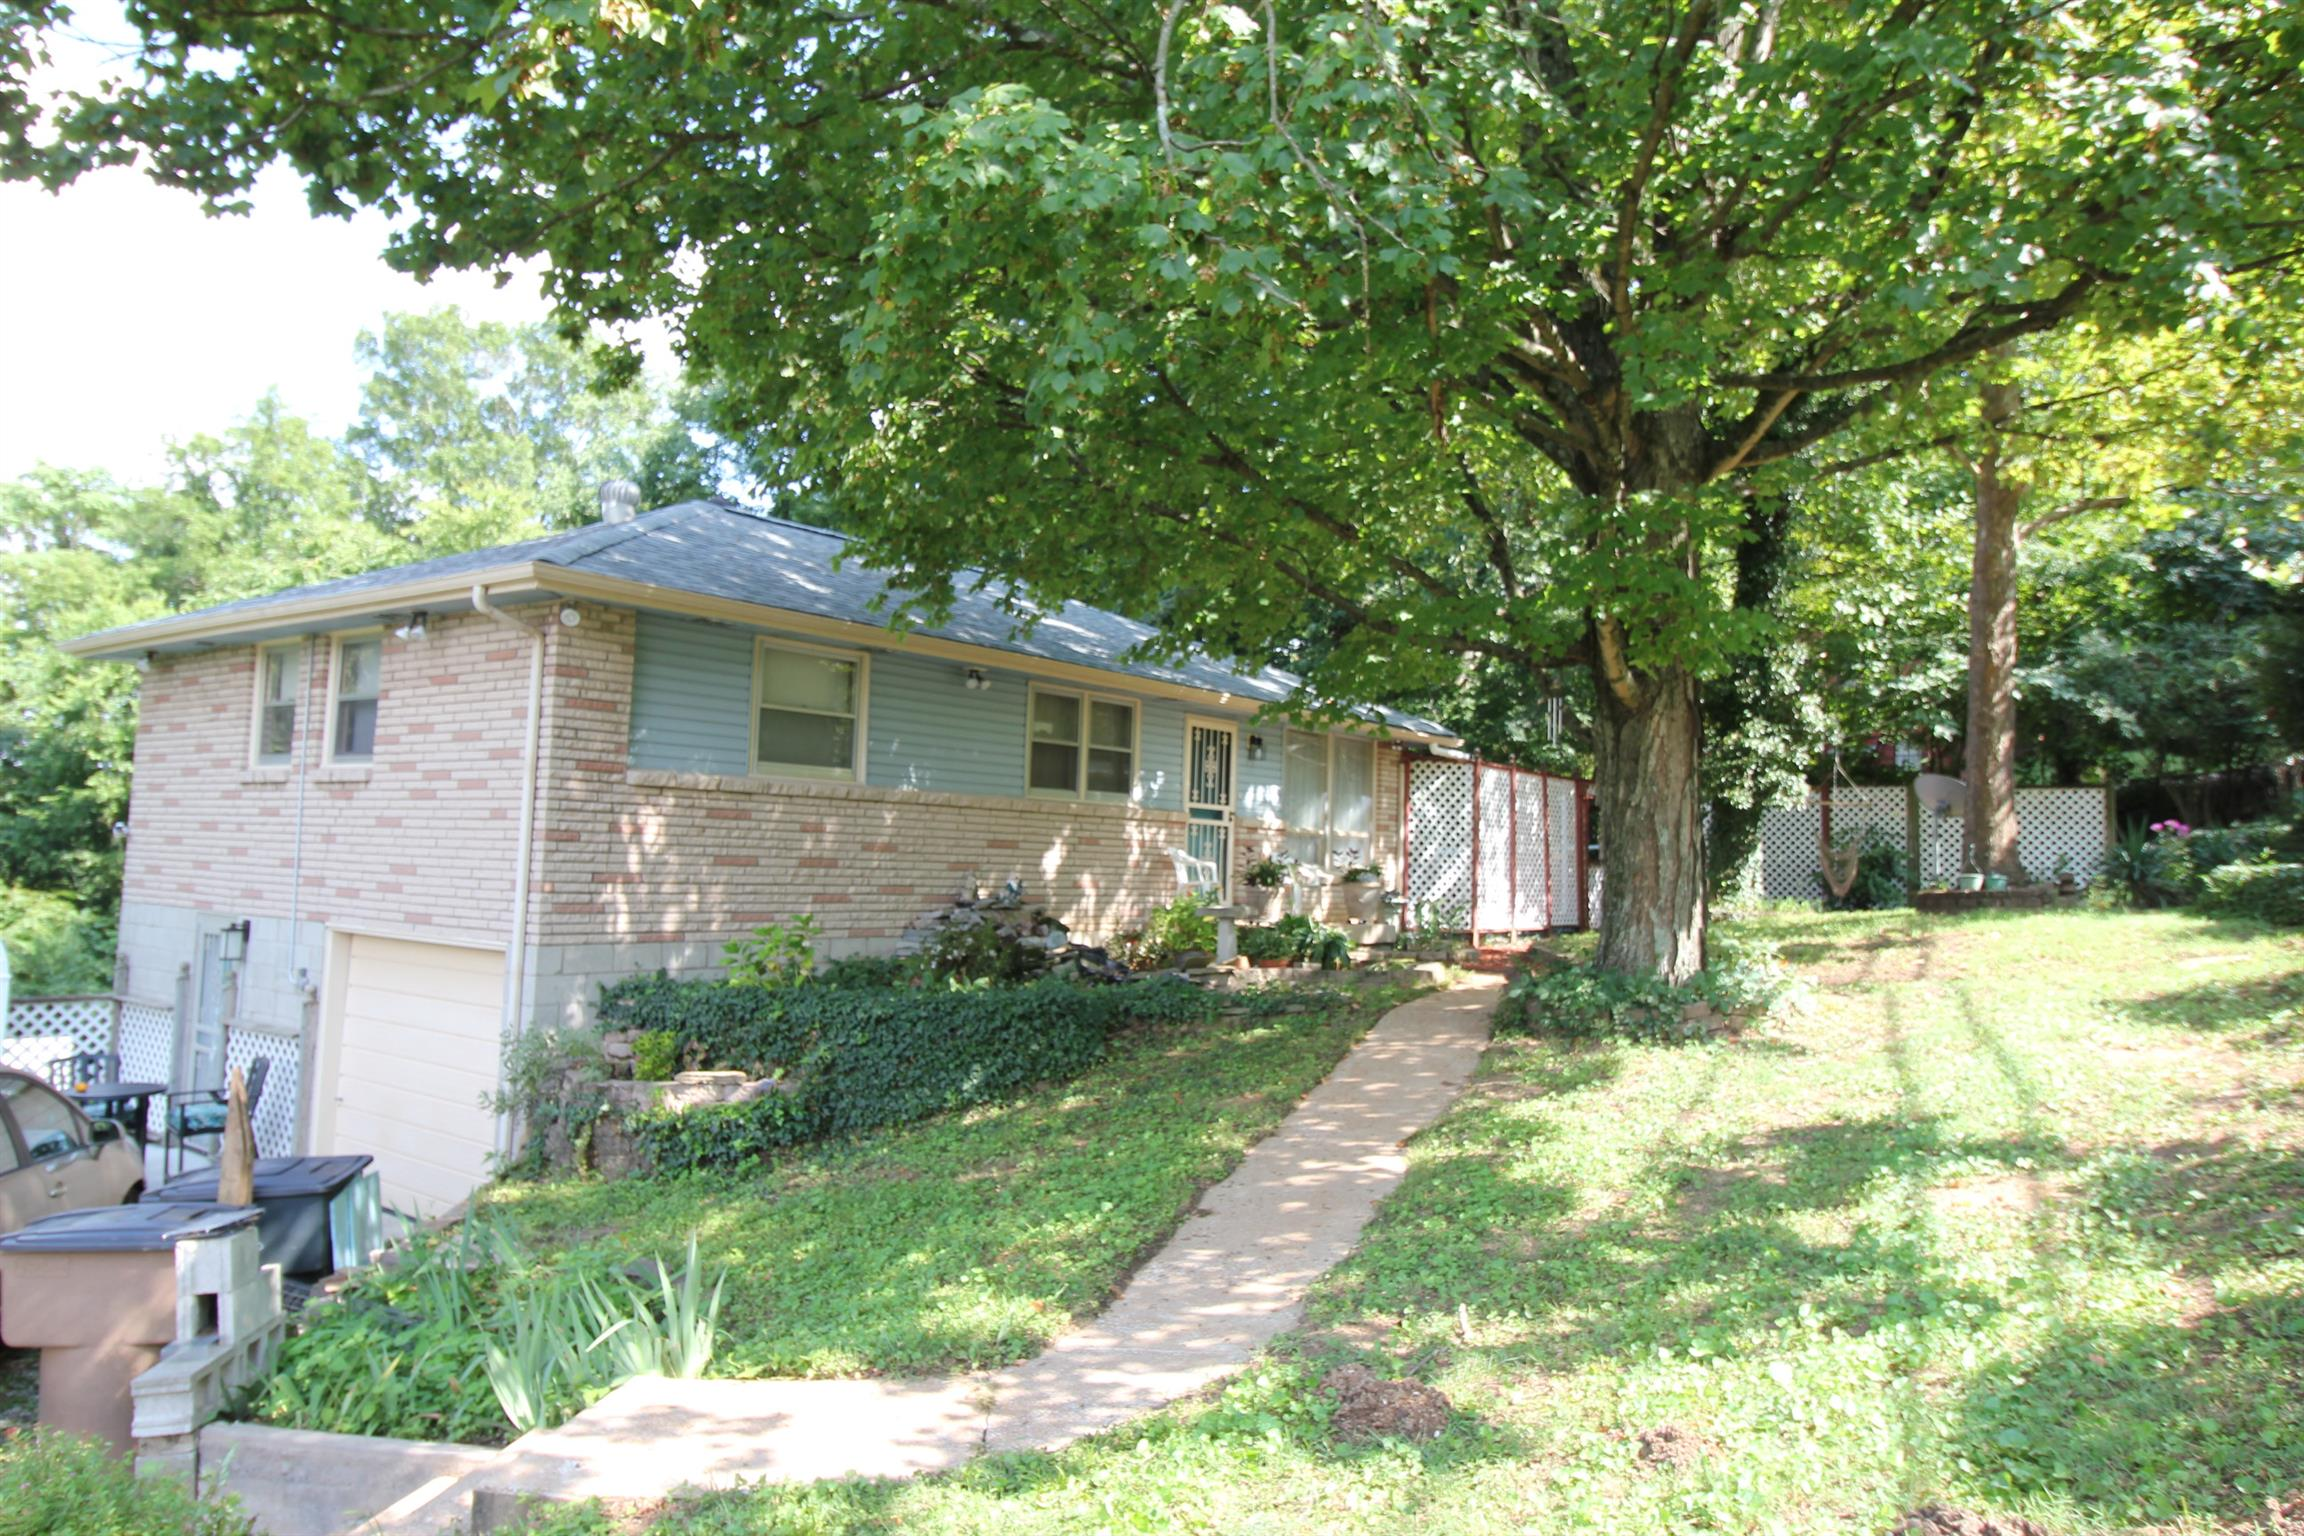 902 Patricia Dr, Nashville, TN 37217 - Nashville, TN real estate listing